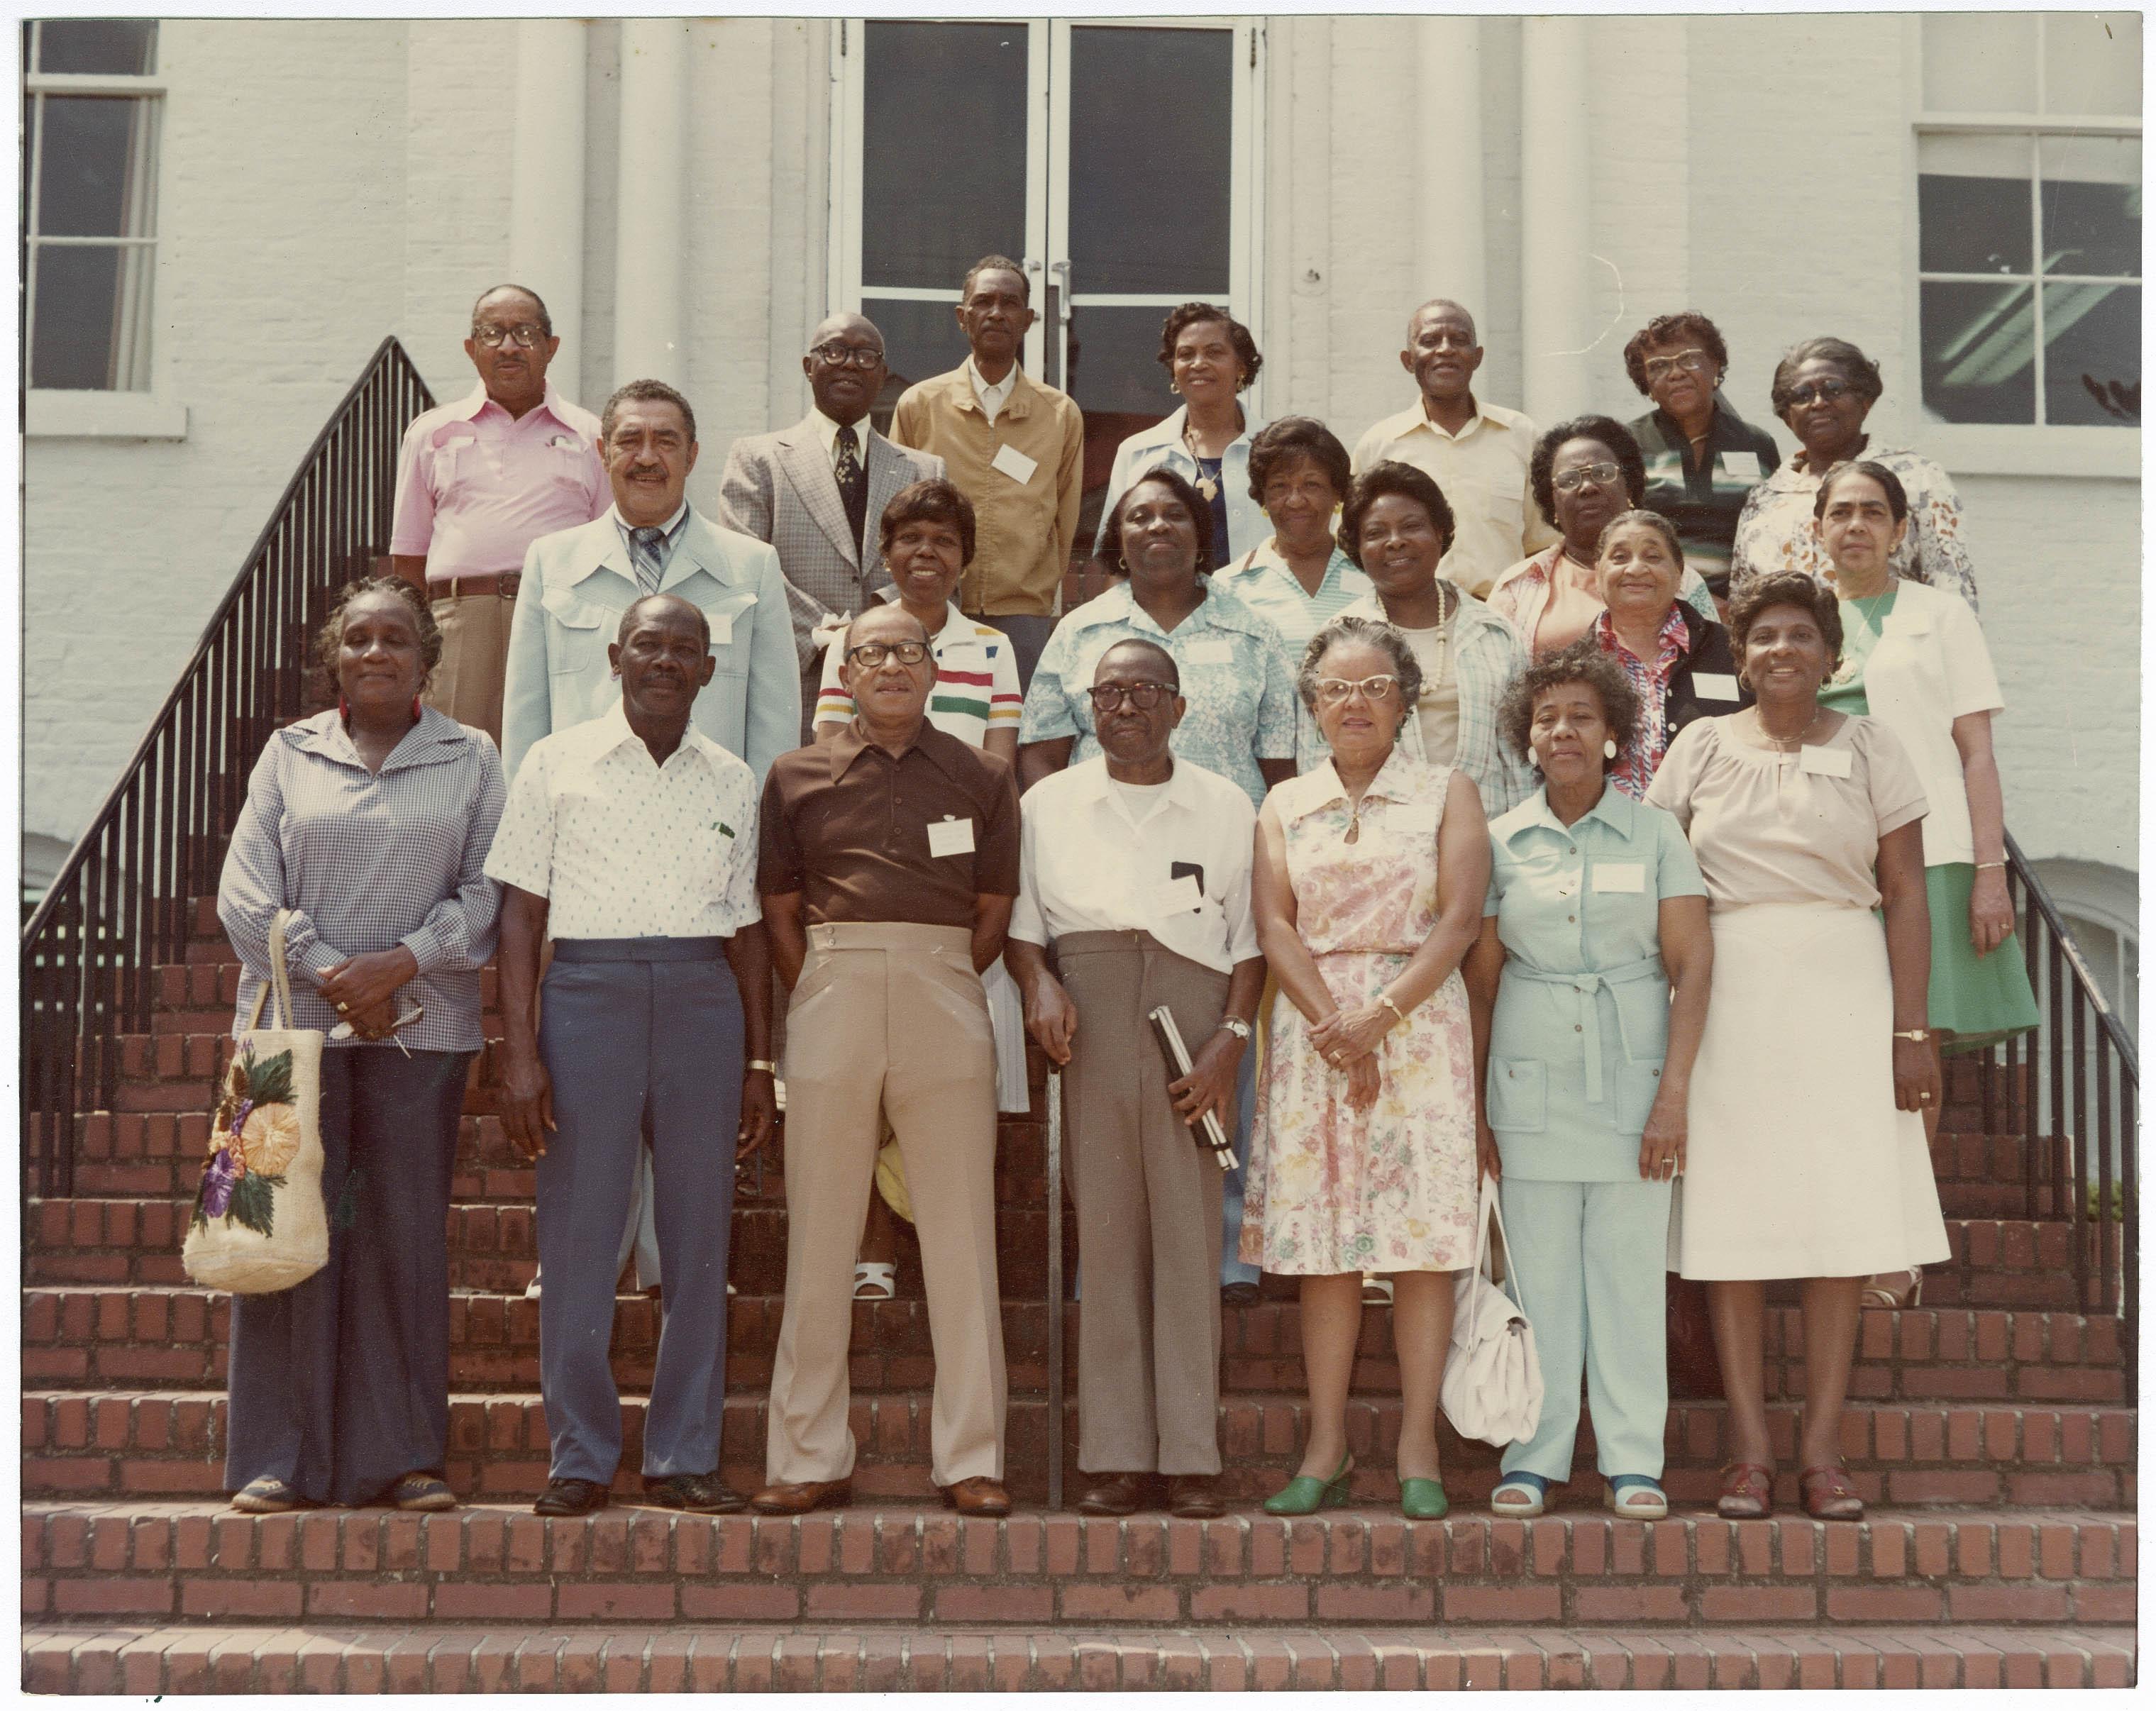 Avery Class Reunion 1930s Graduates